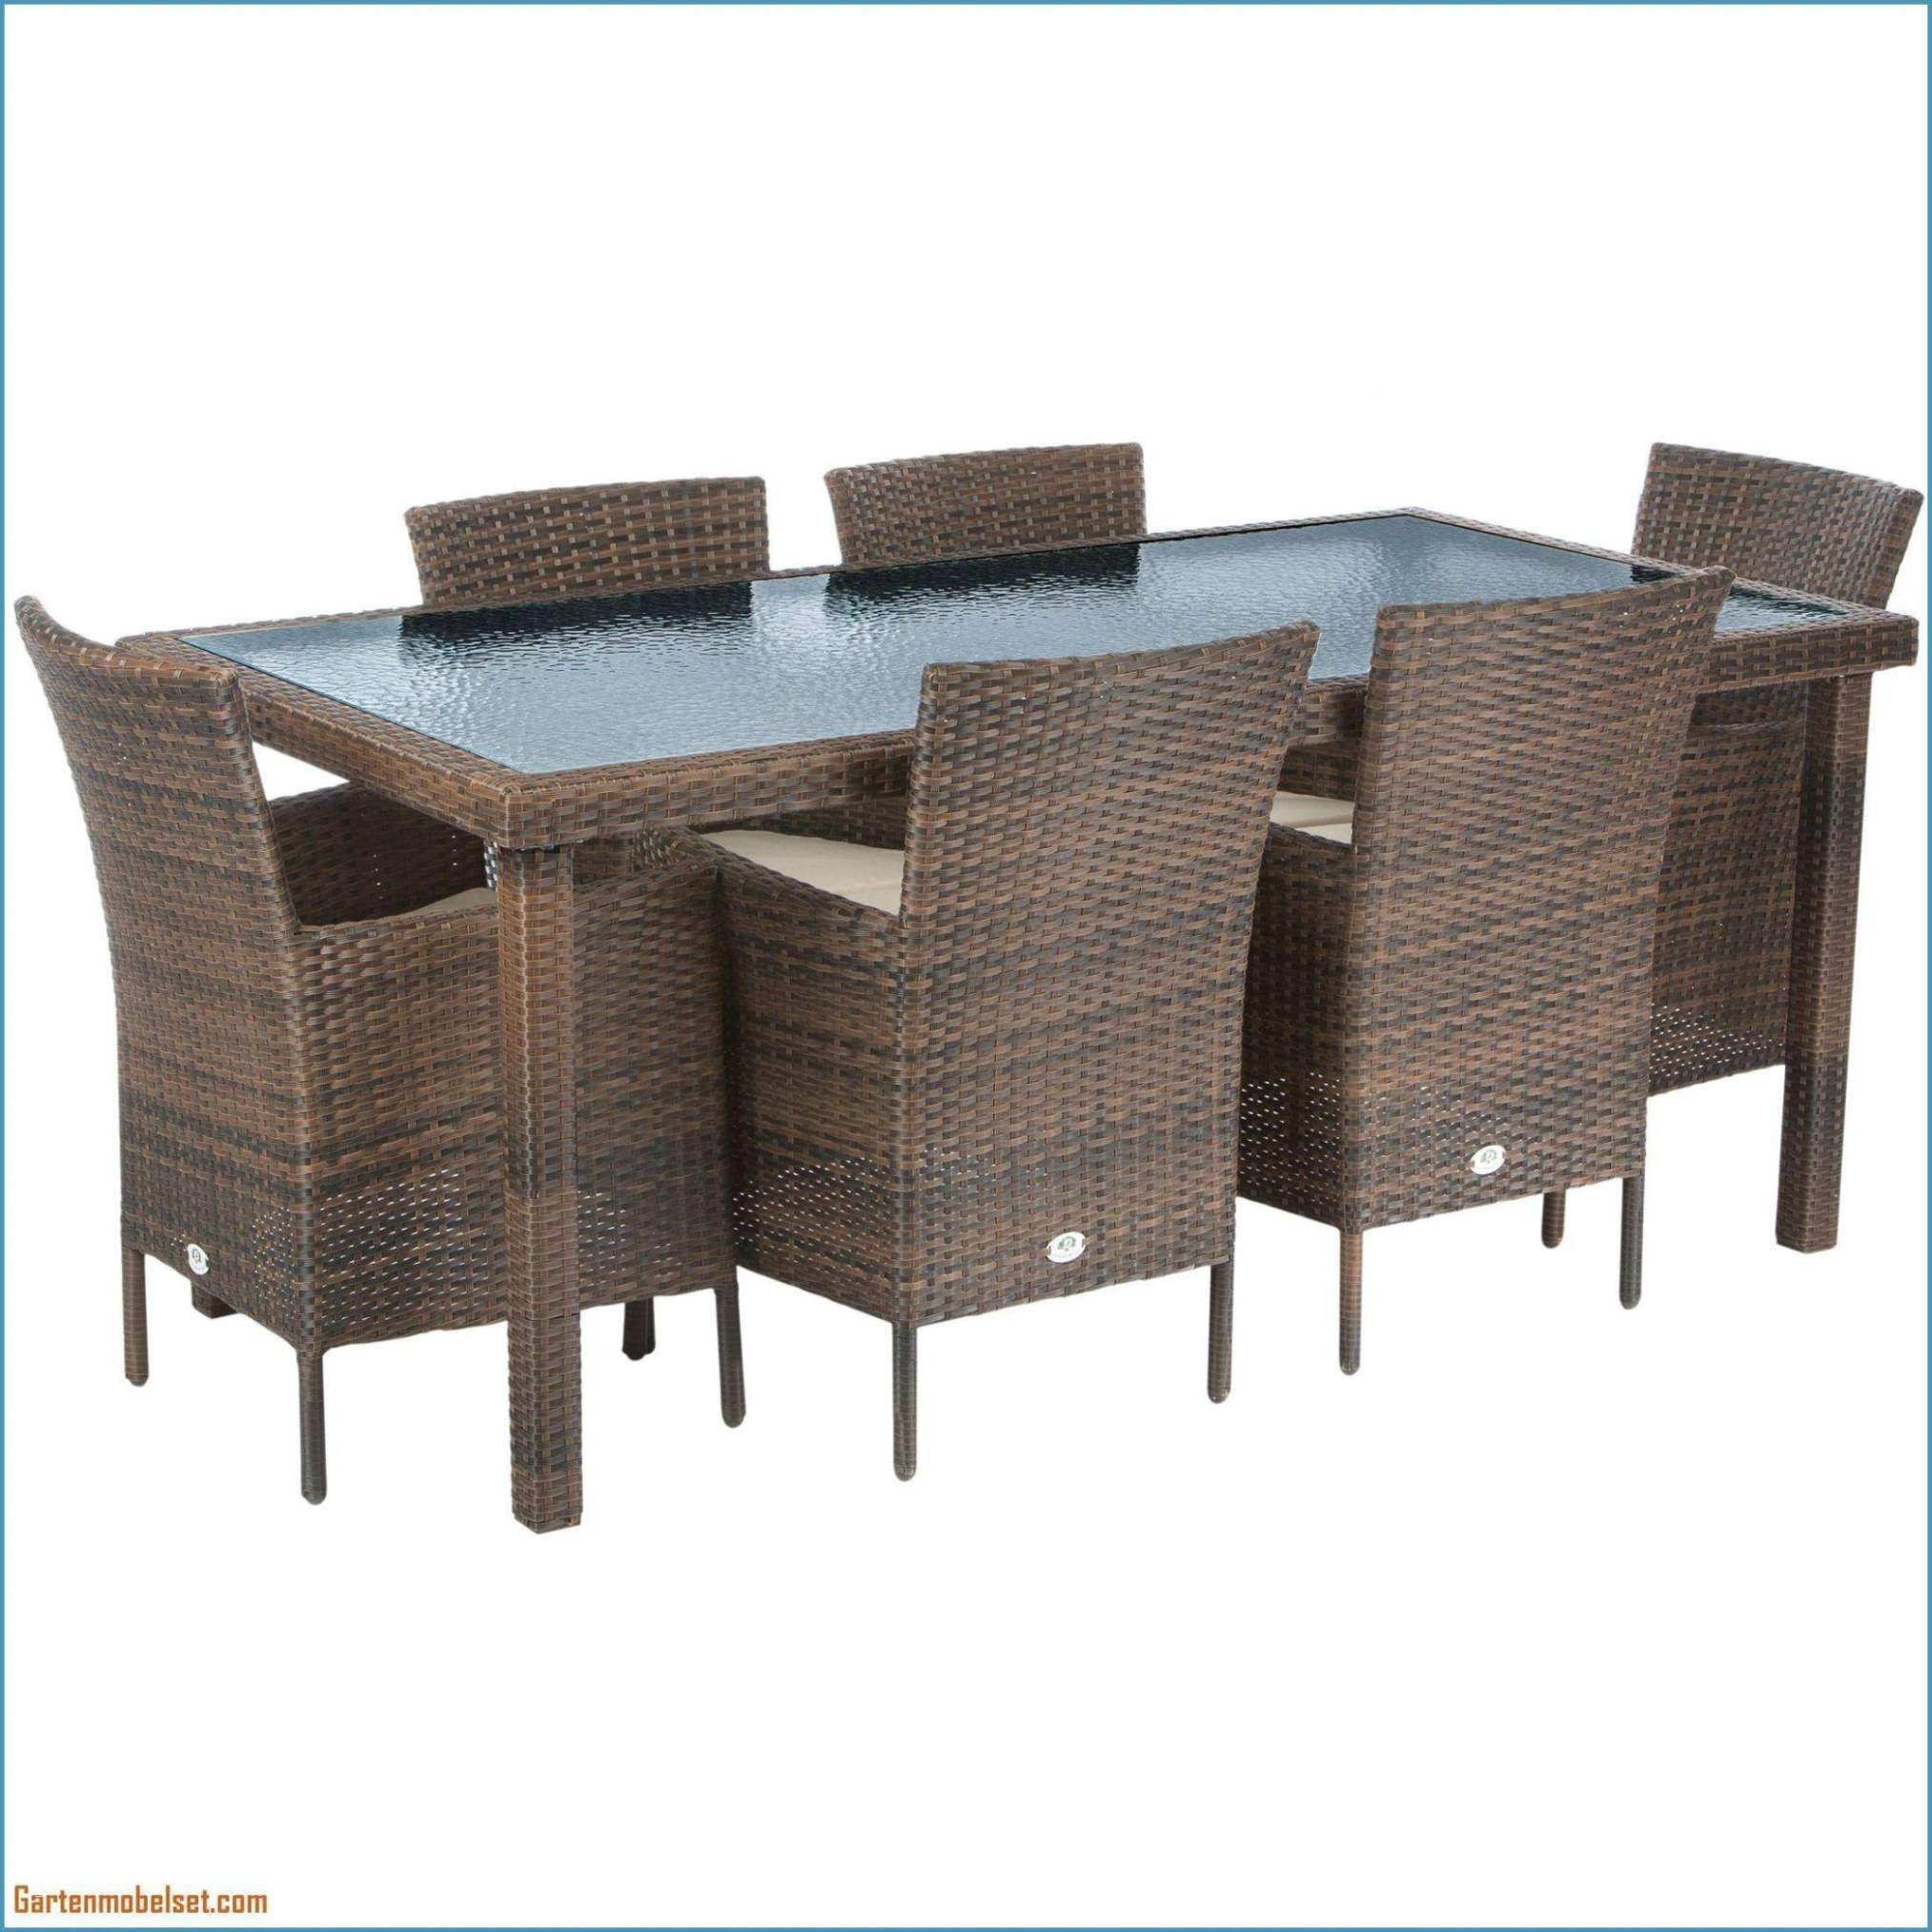 lounge mobel selber bauen yct projekte lounge mobel selber bauen lounge mobel selber bauen 1